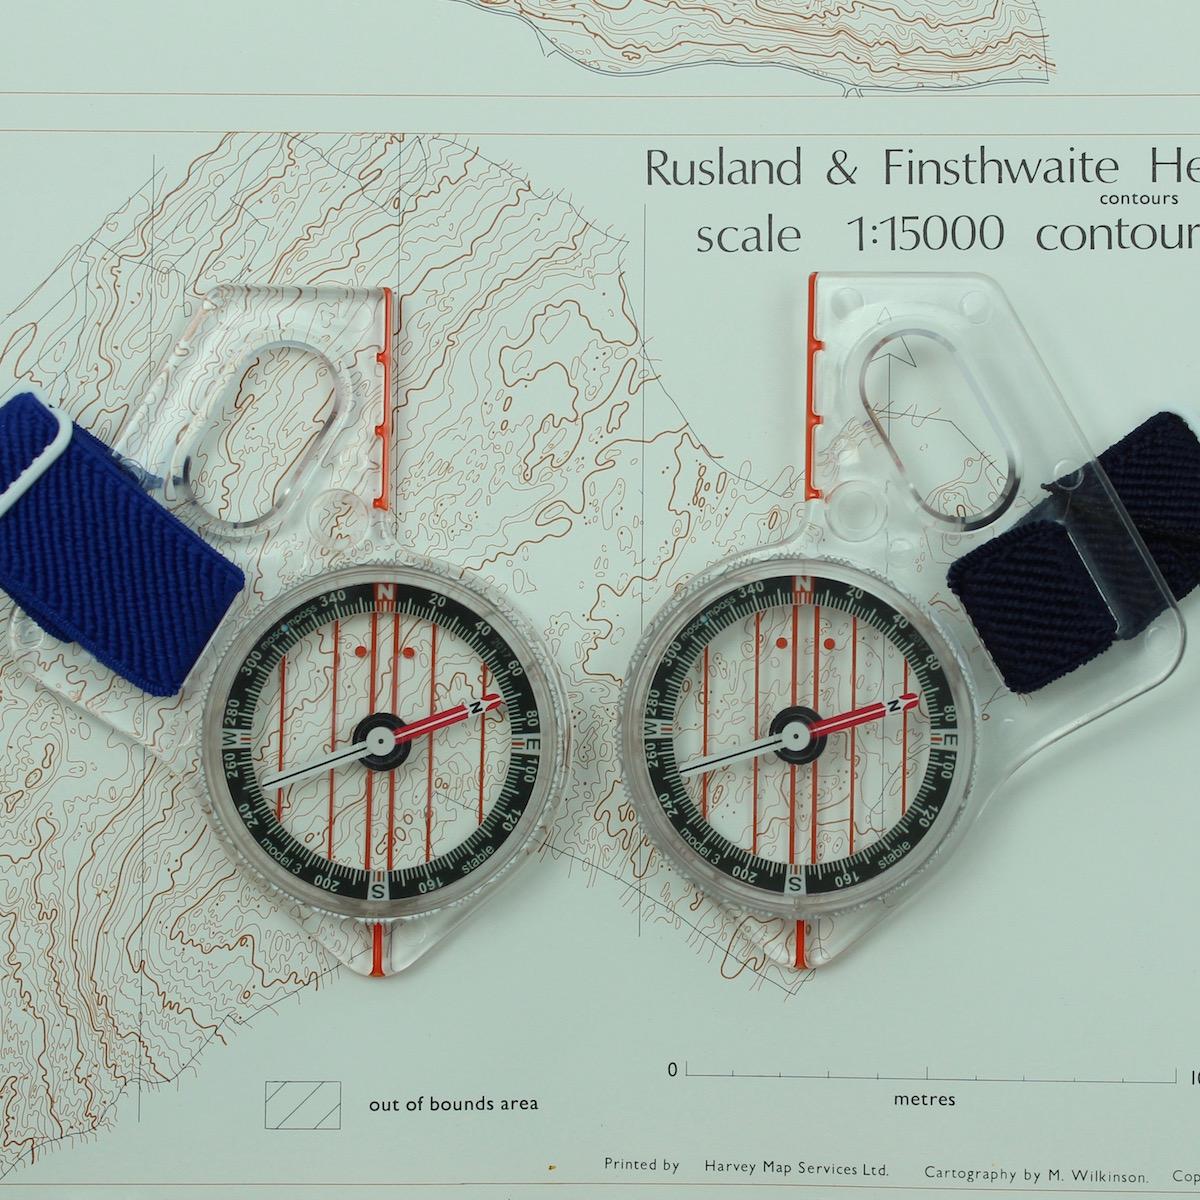 Southern Hemisphere Compasses